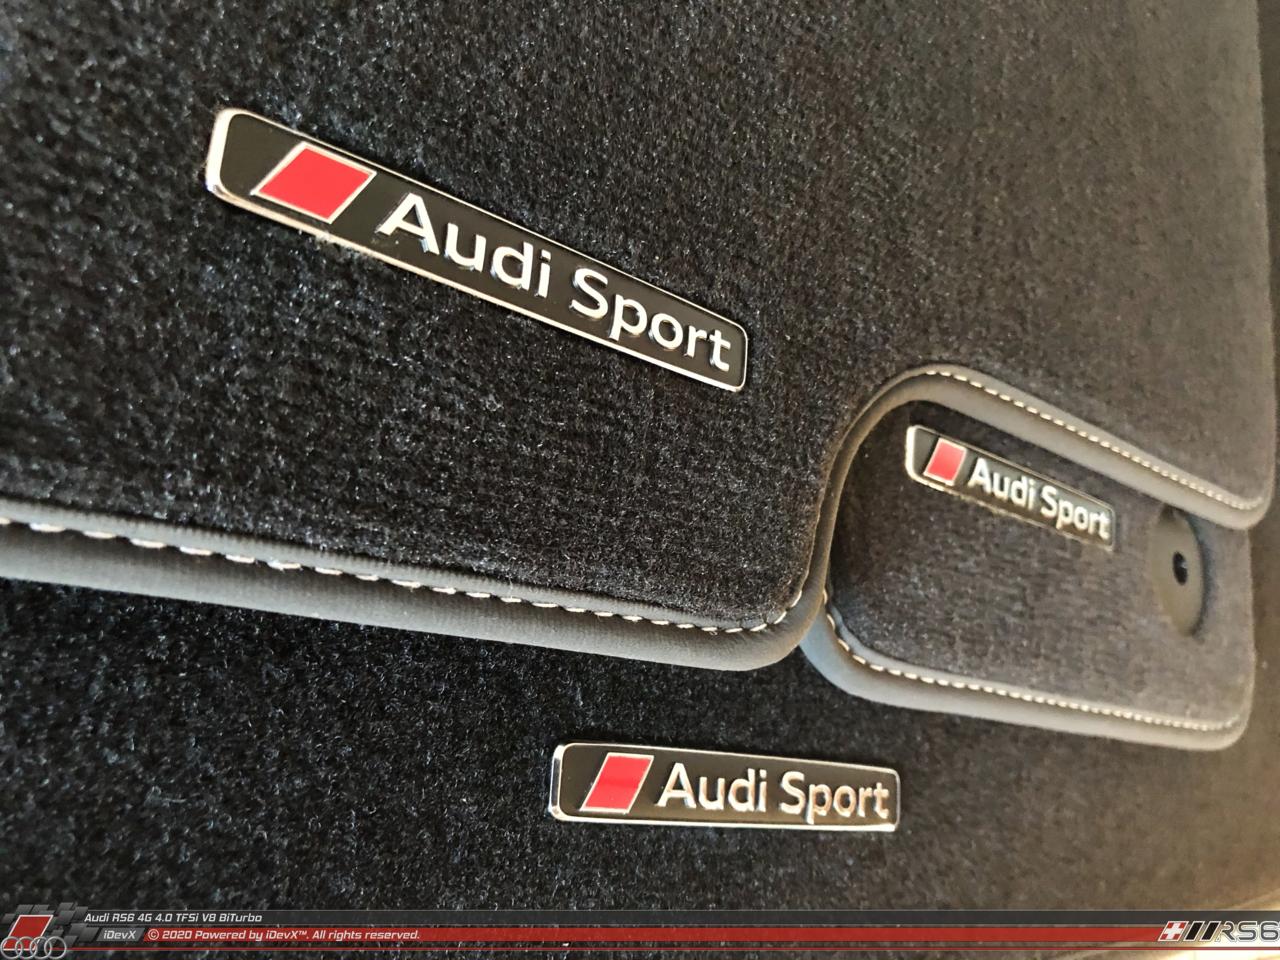 15_08.2019_Audi-RS6_iDevX_017.png